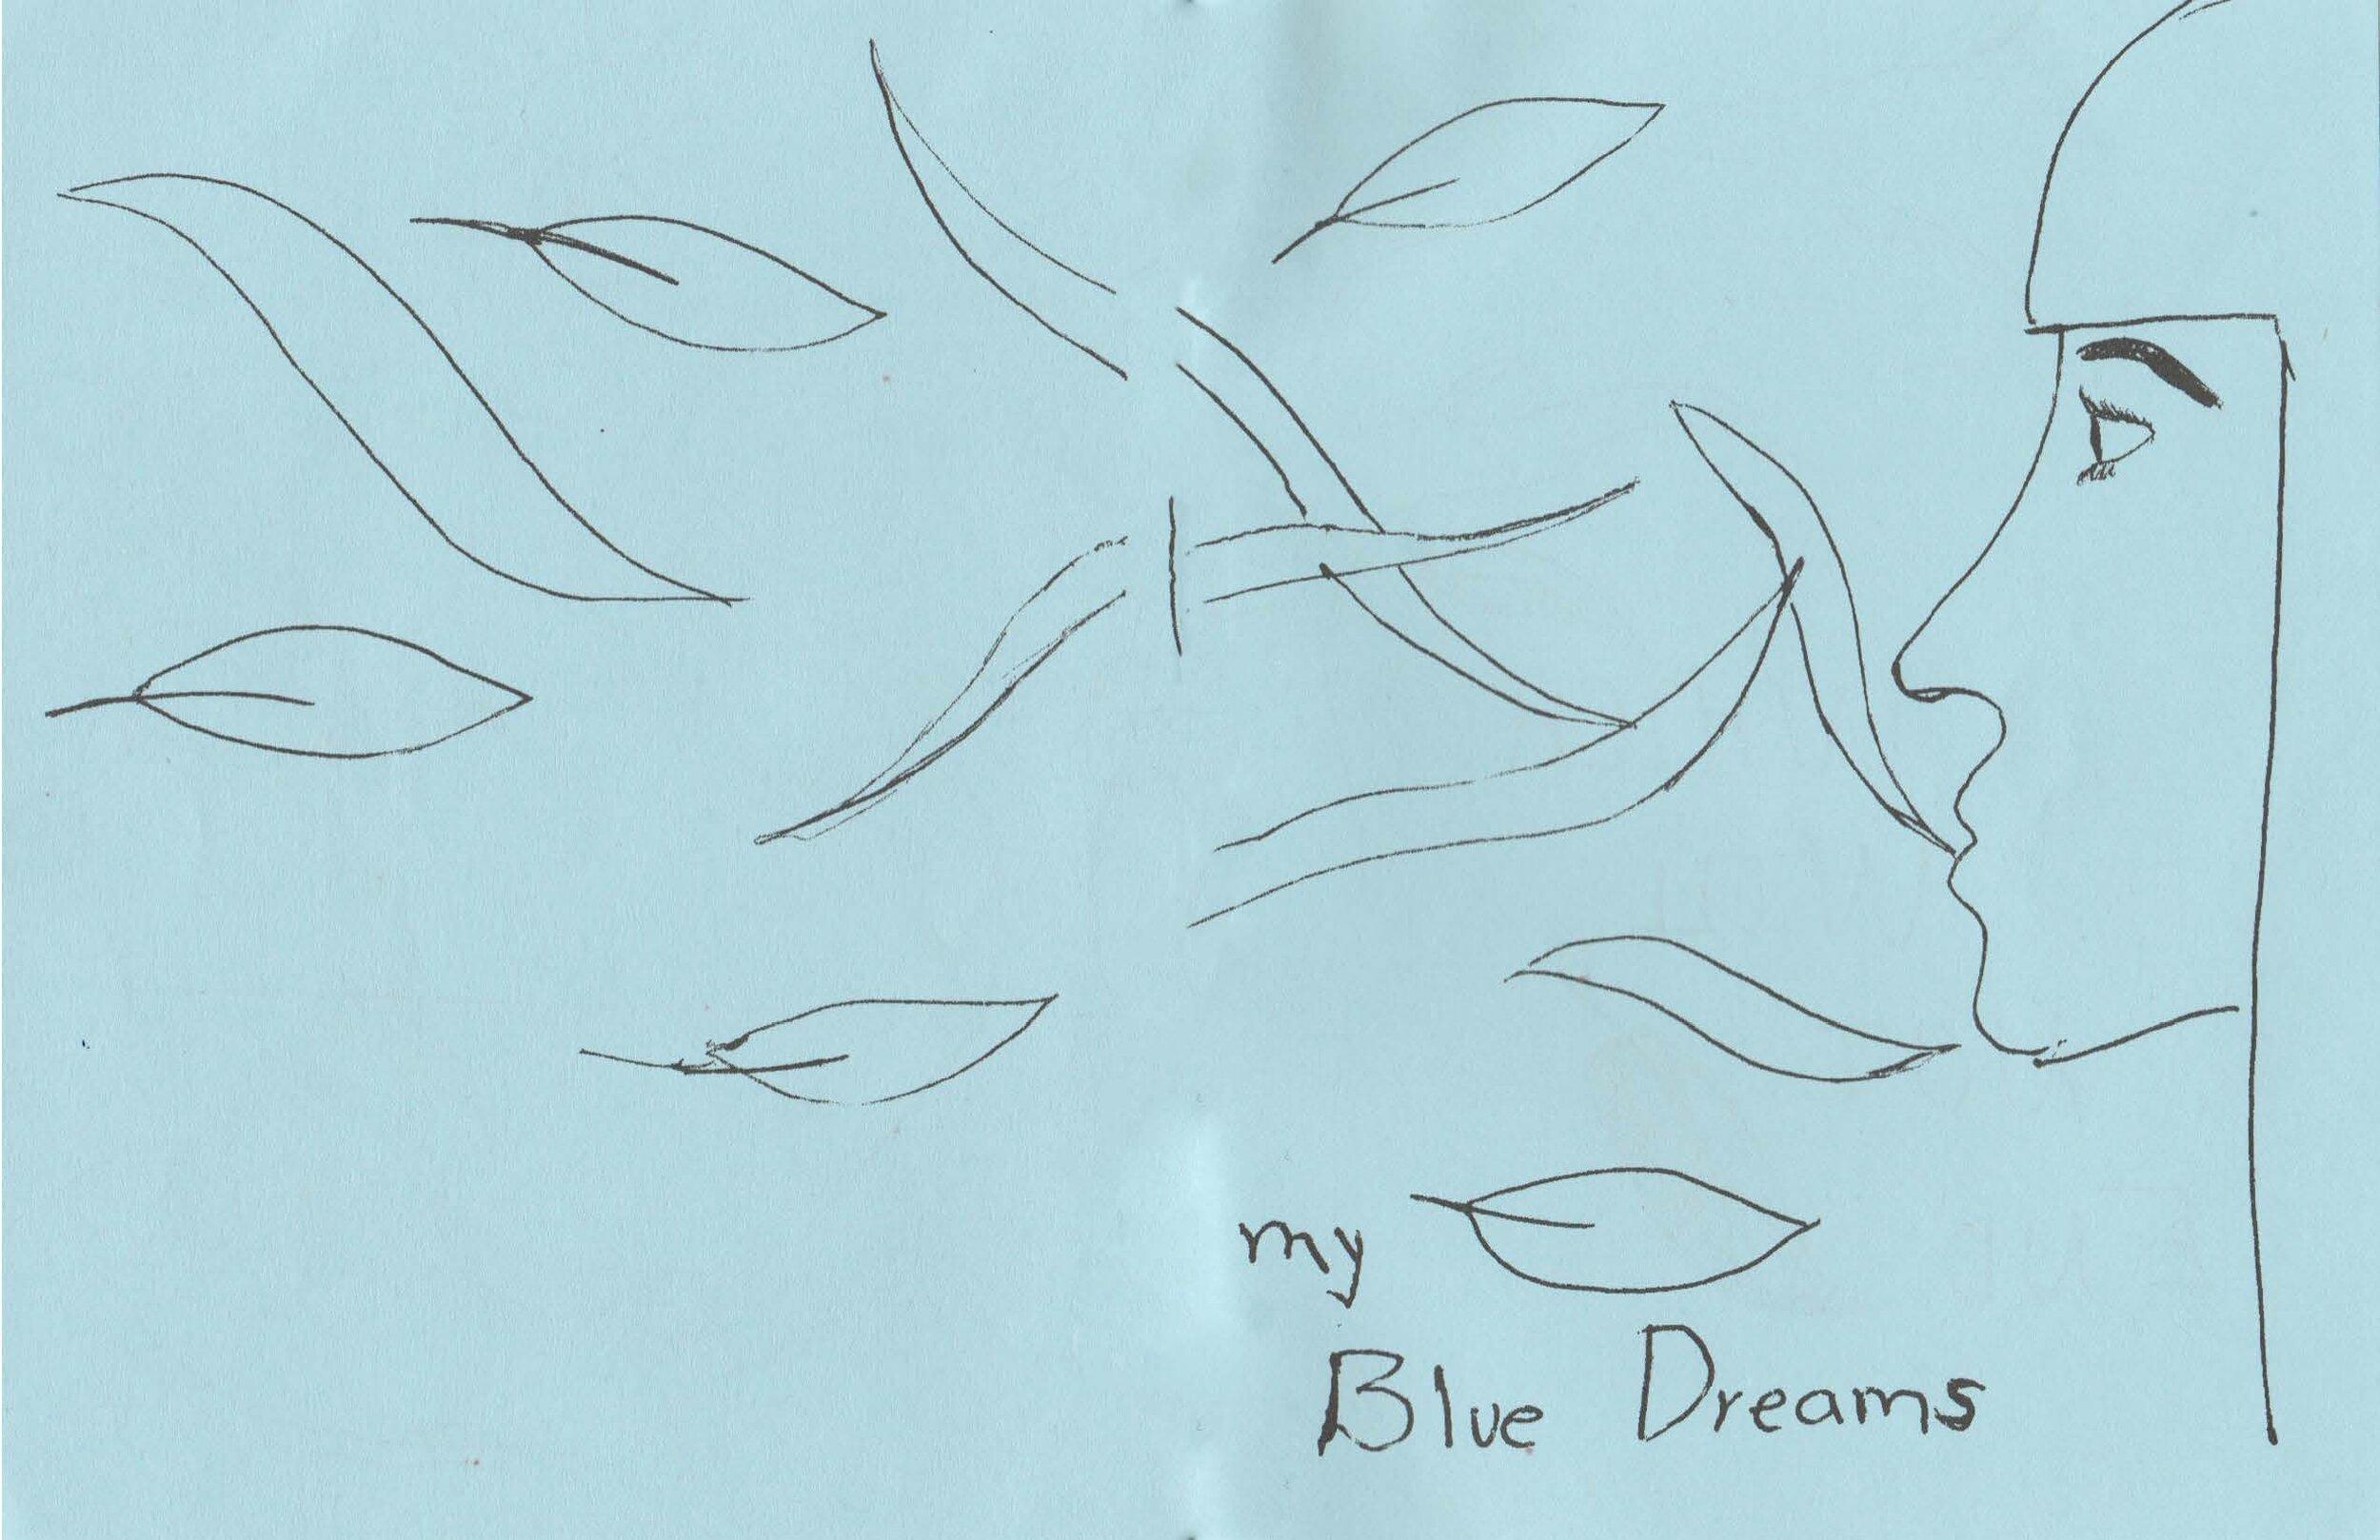 Windy Love_Page_6_Image_0001.jpg